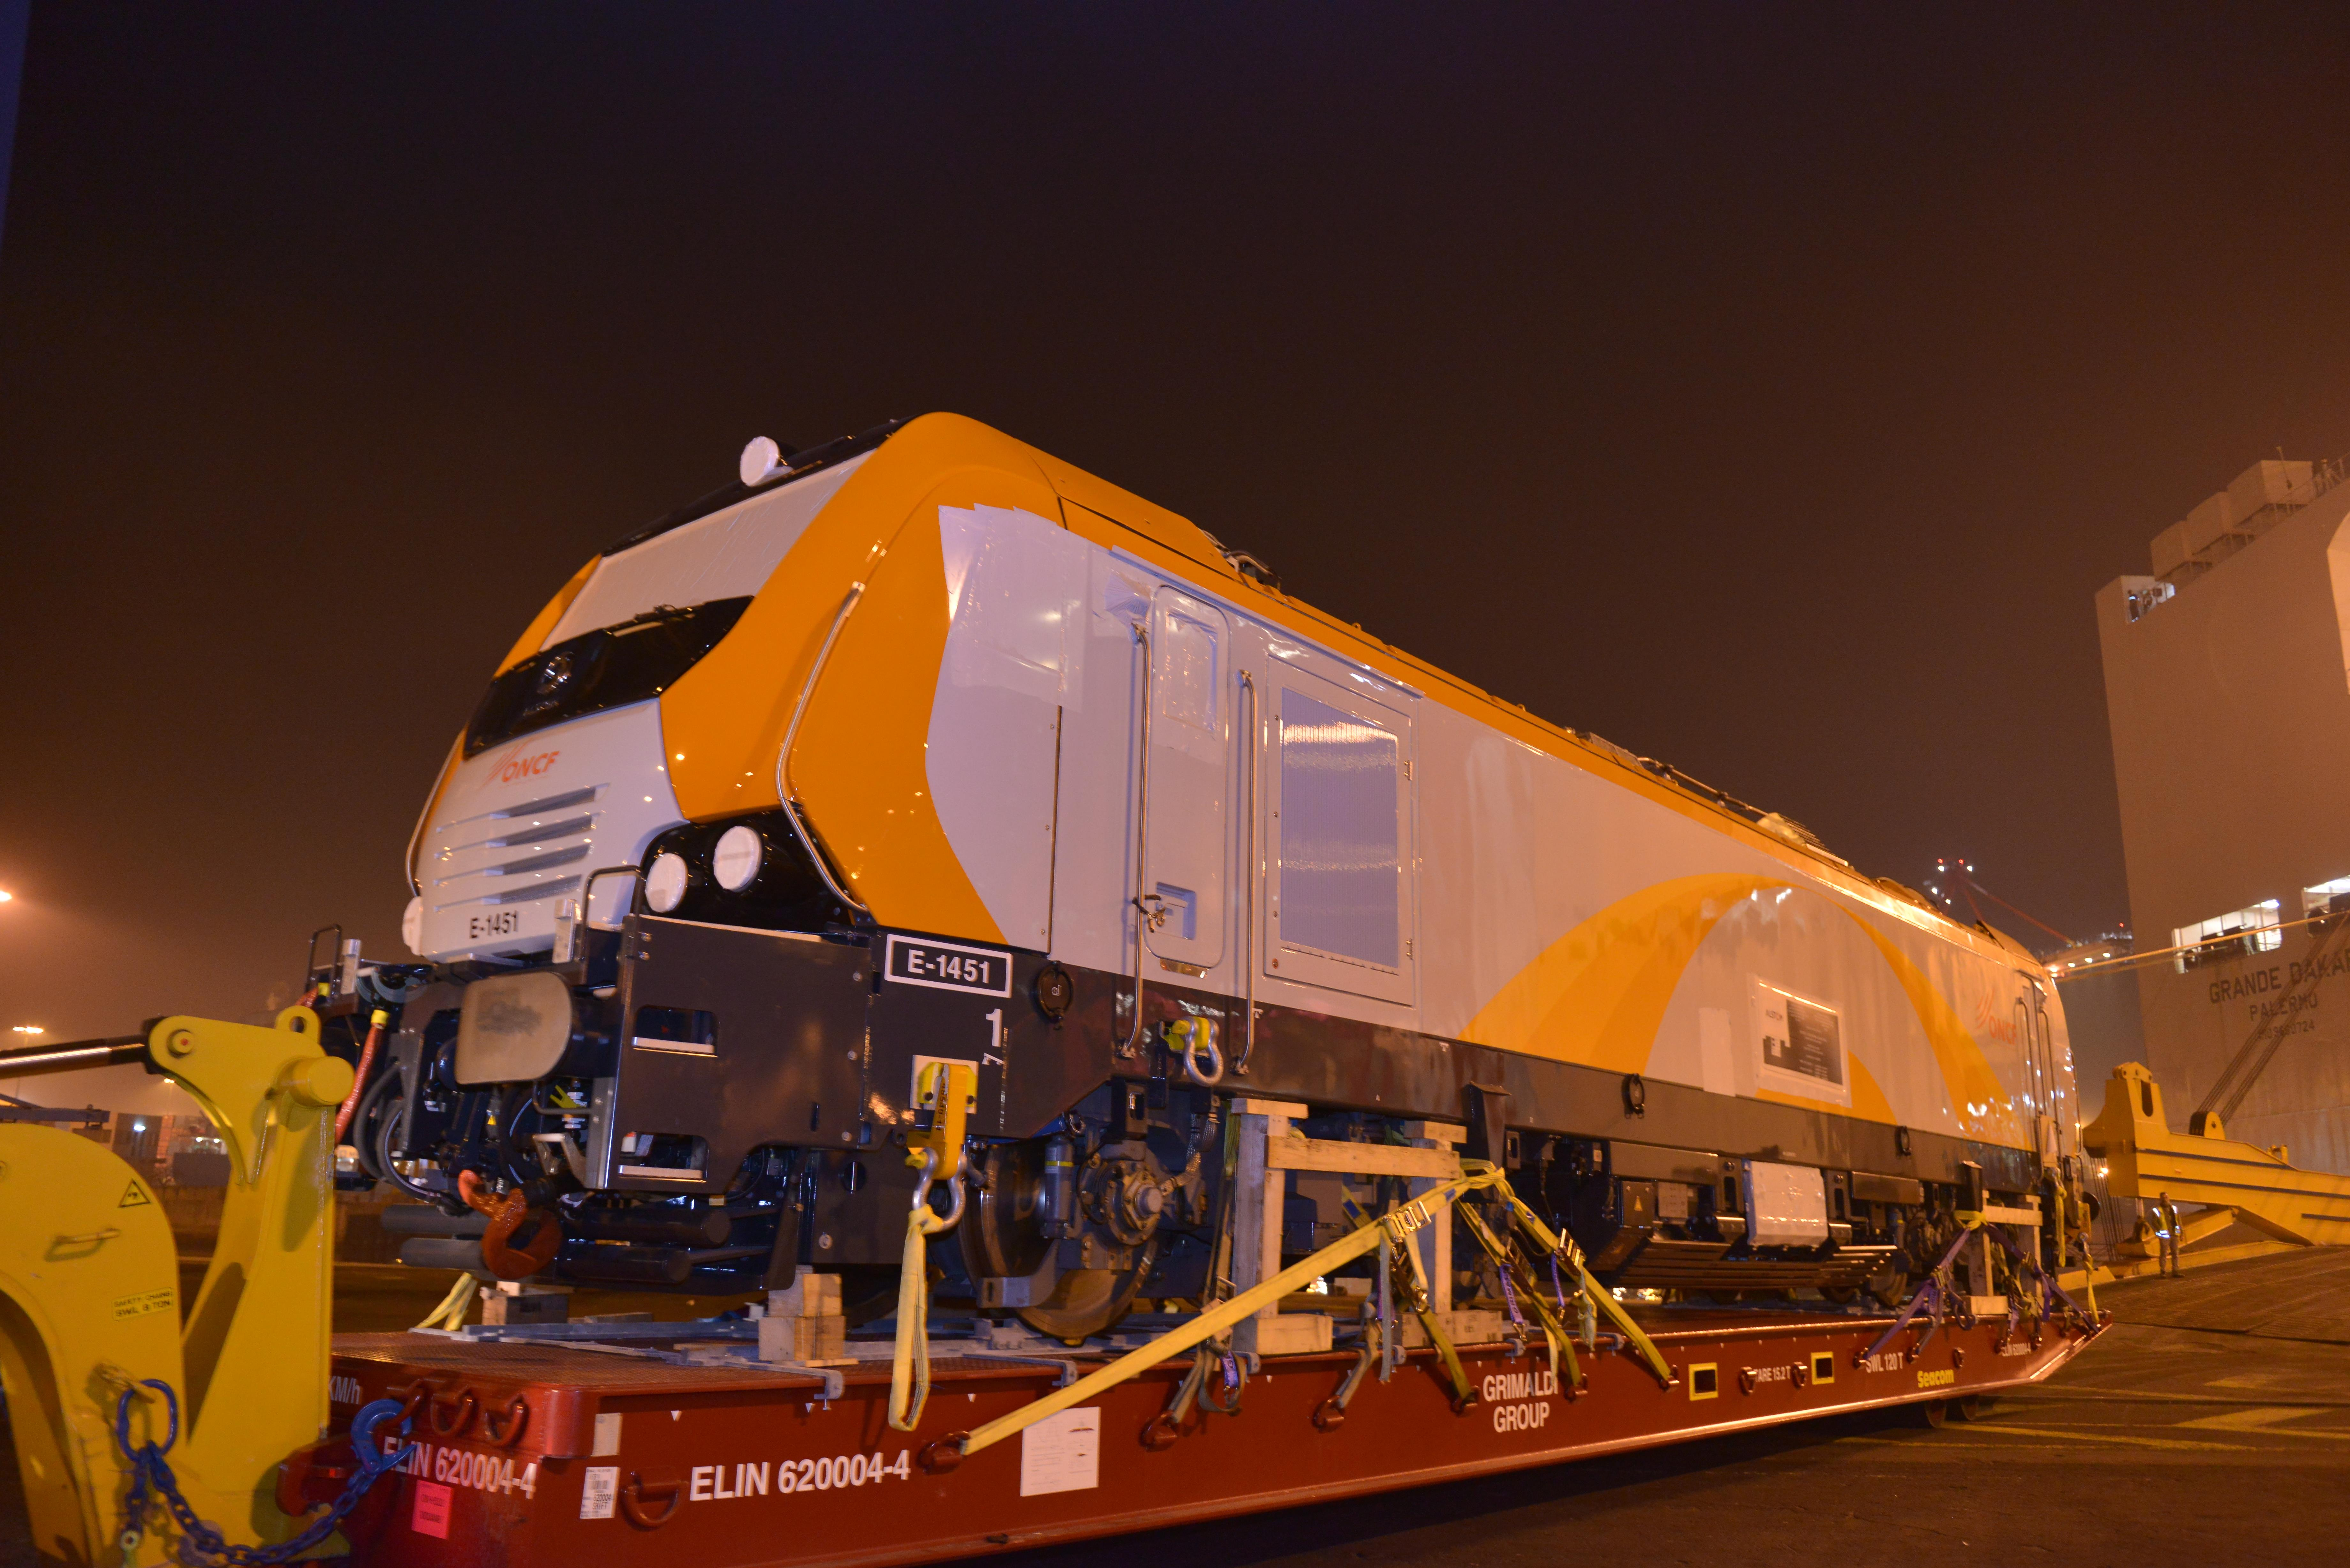 Alstom Prima M4 electric locomotive